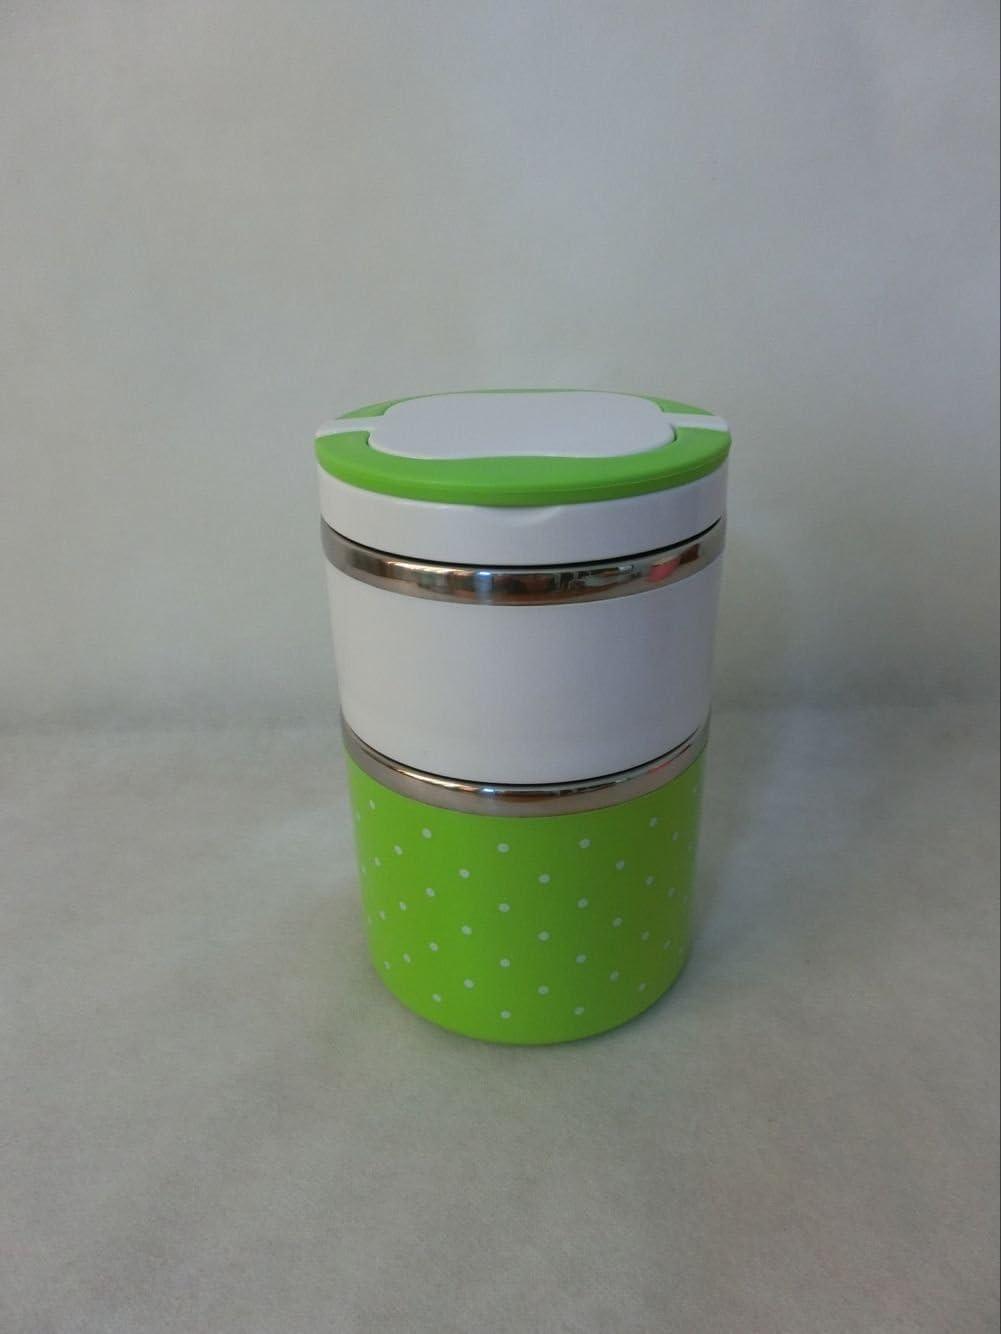 lunch boxes,lunch box,lunch boxex,lunch boxx,box lunch box,lunch